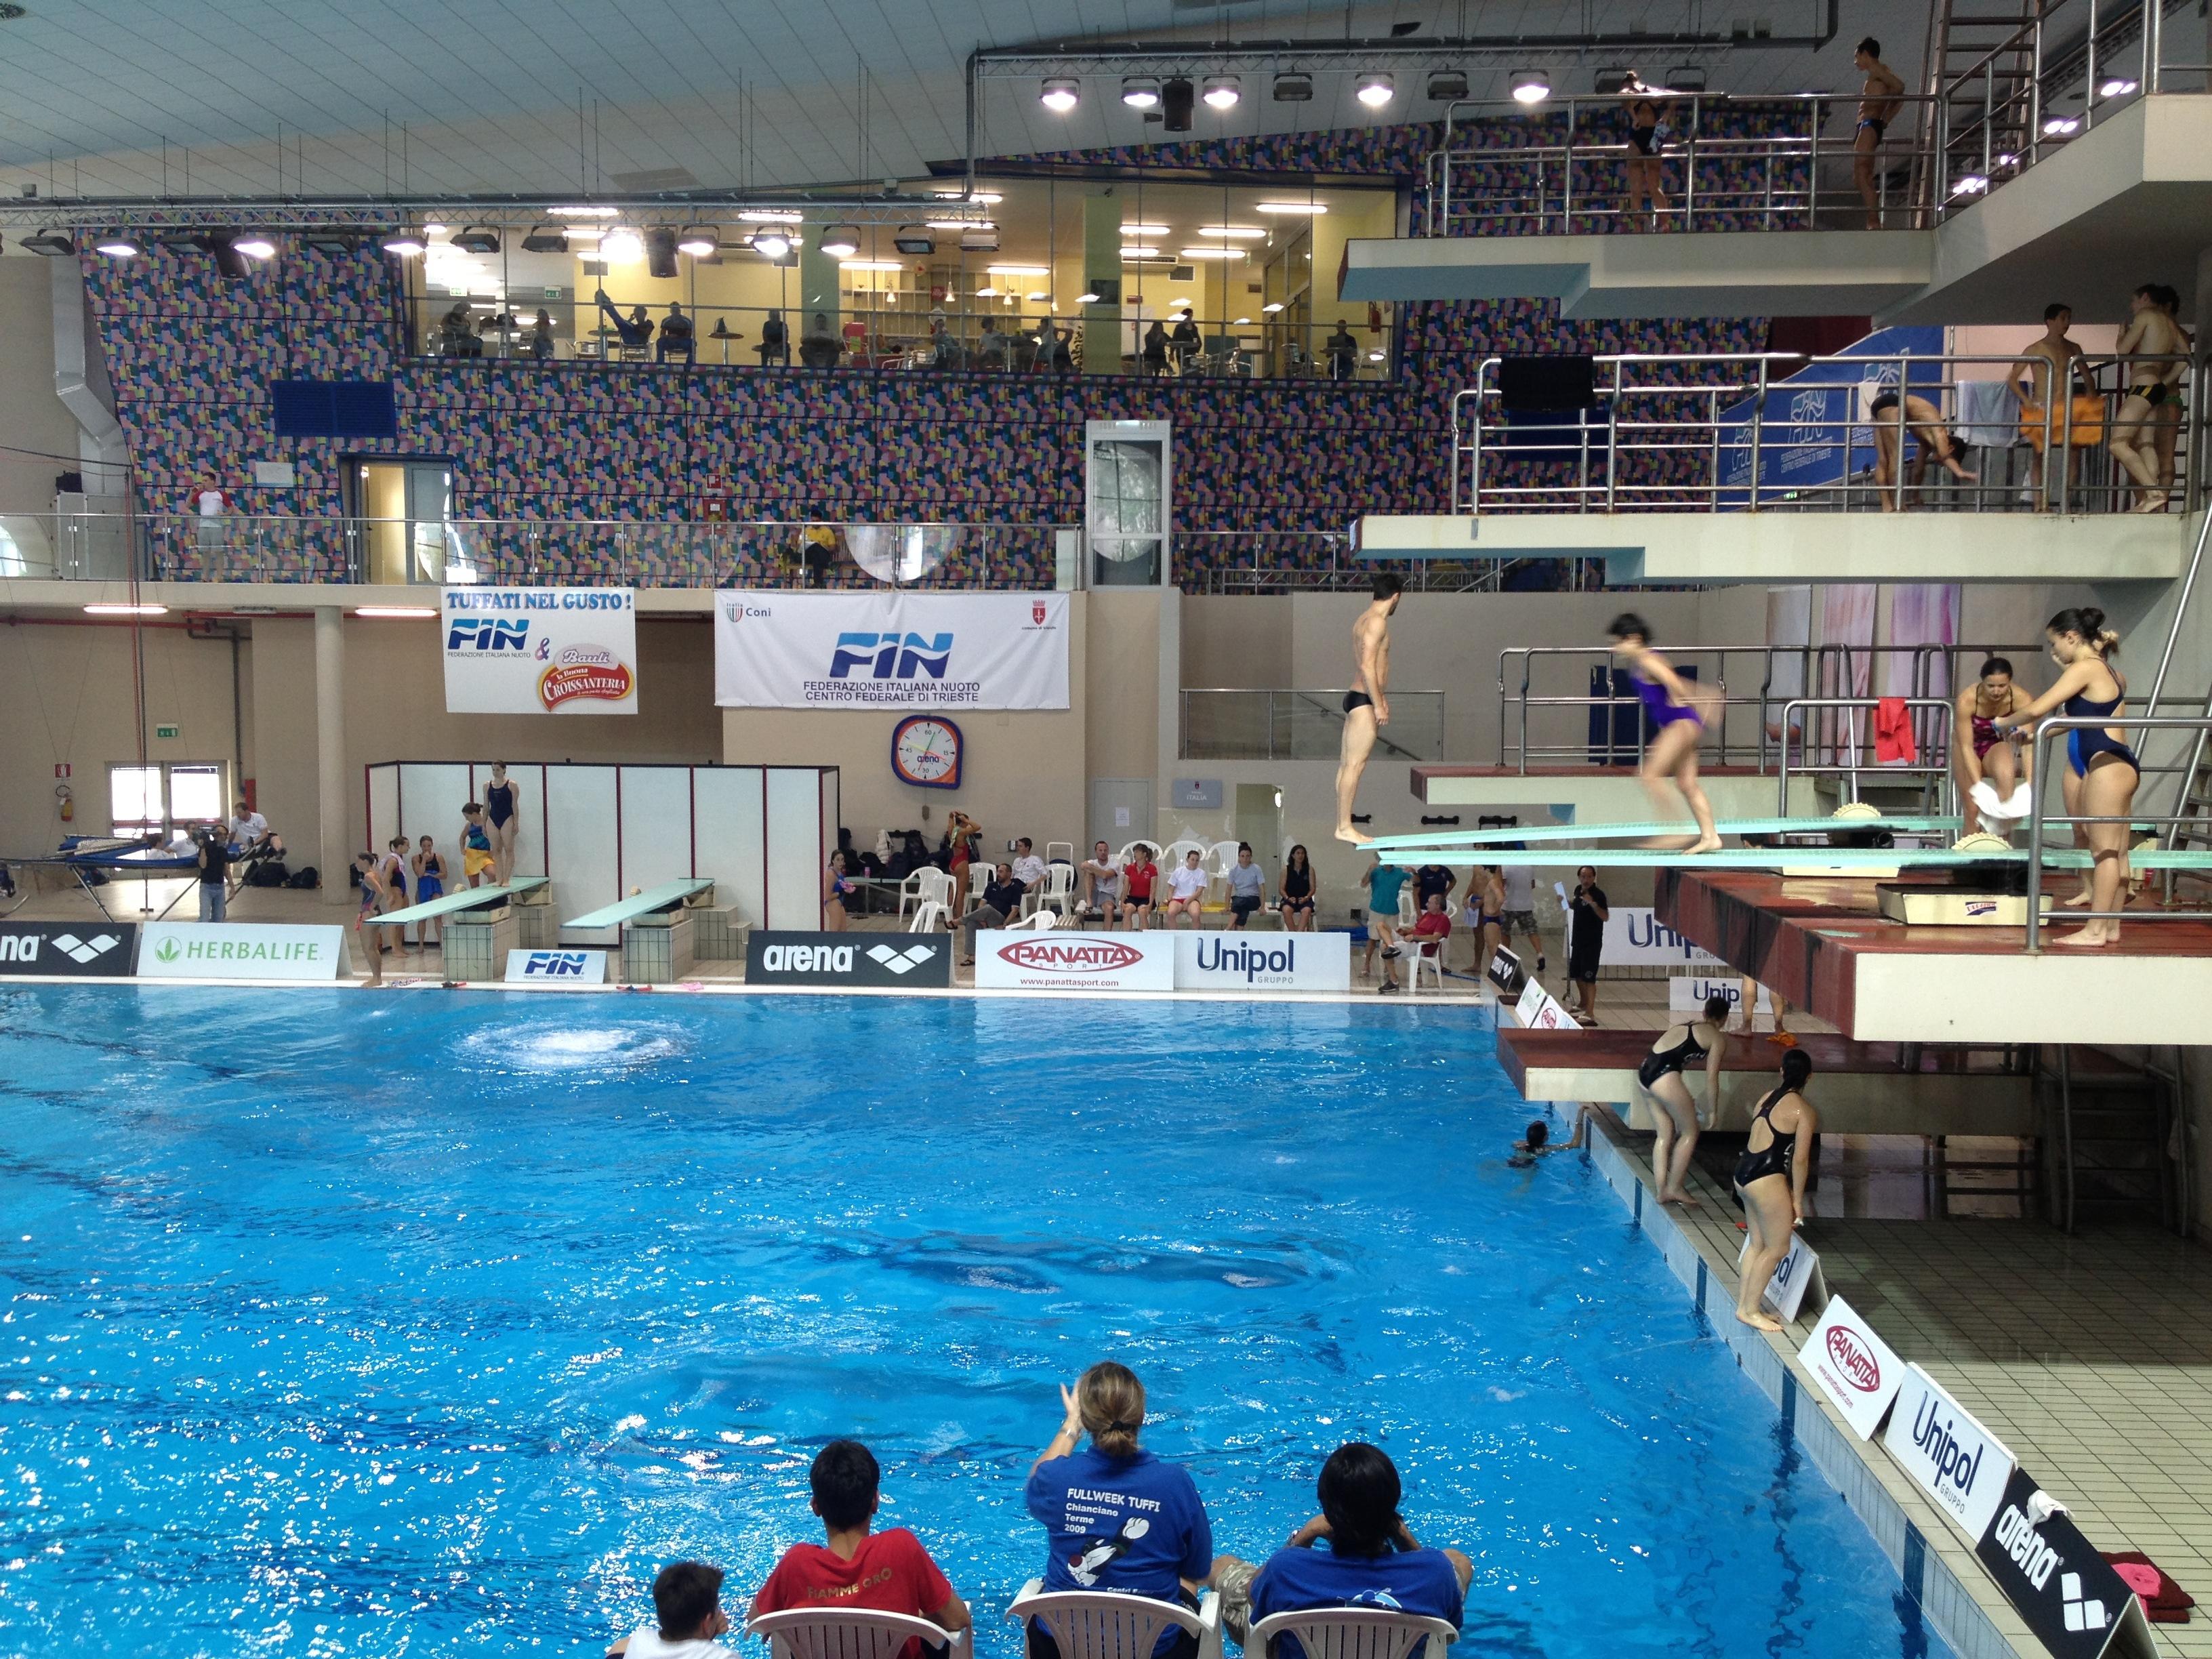 Tuffi Campionati Italiani assoluti estivi Trieste 2013 002